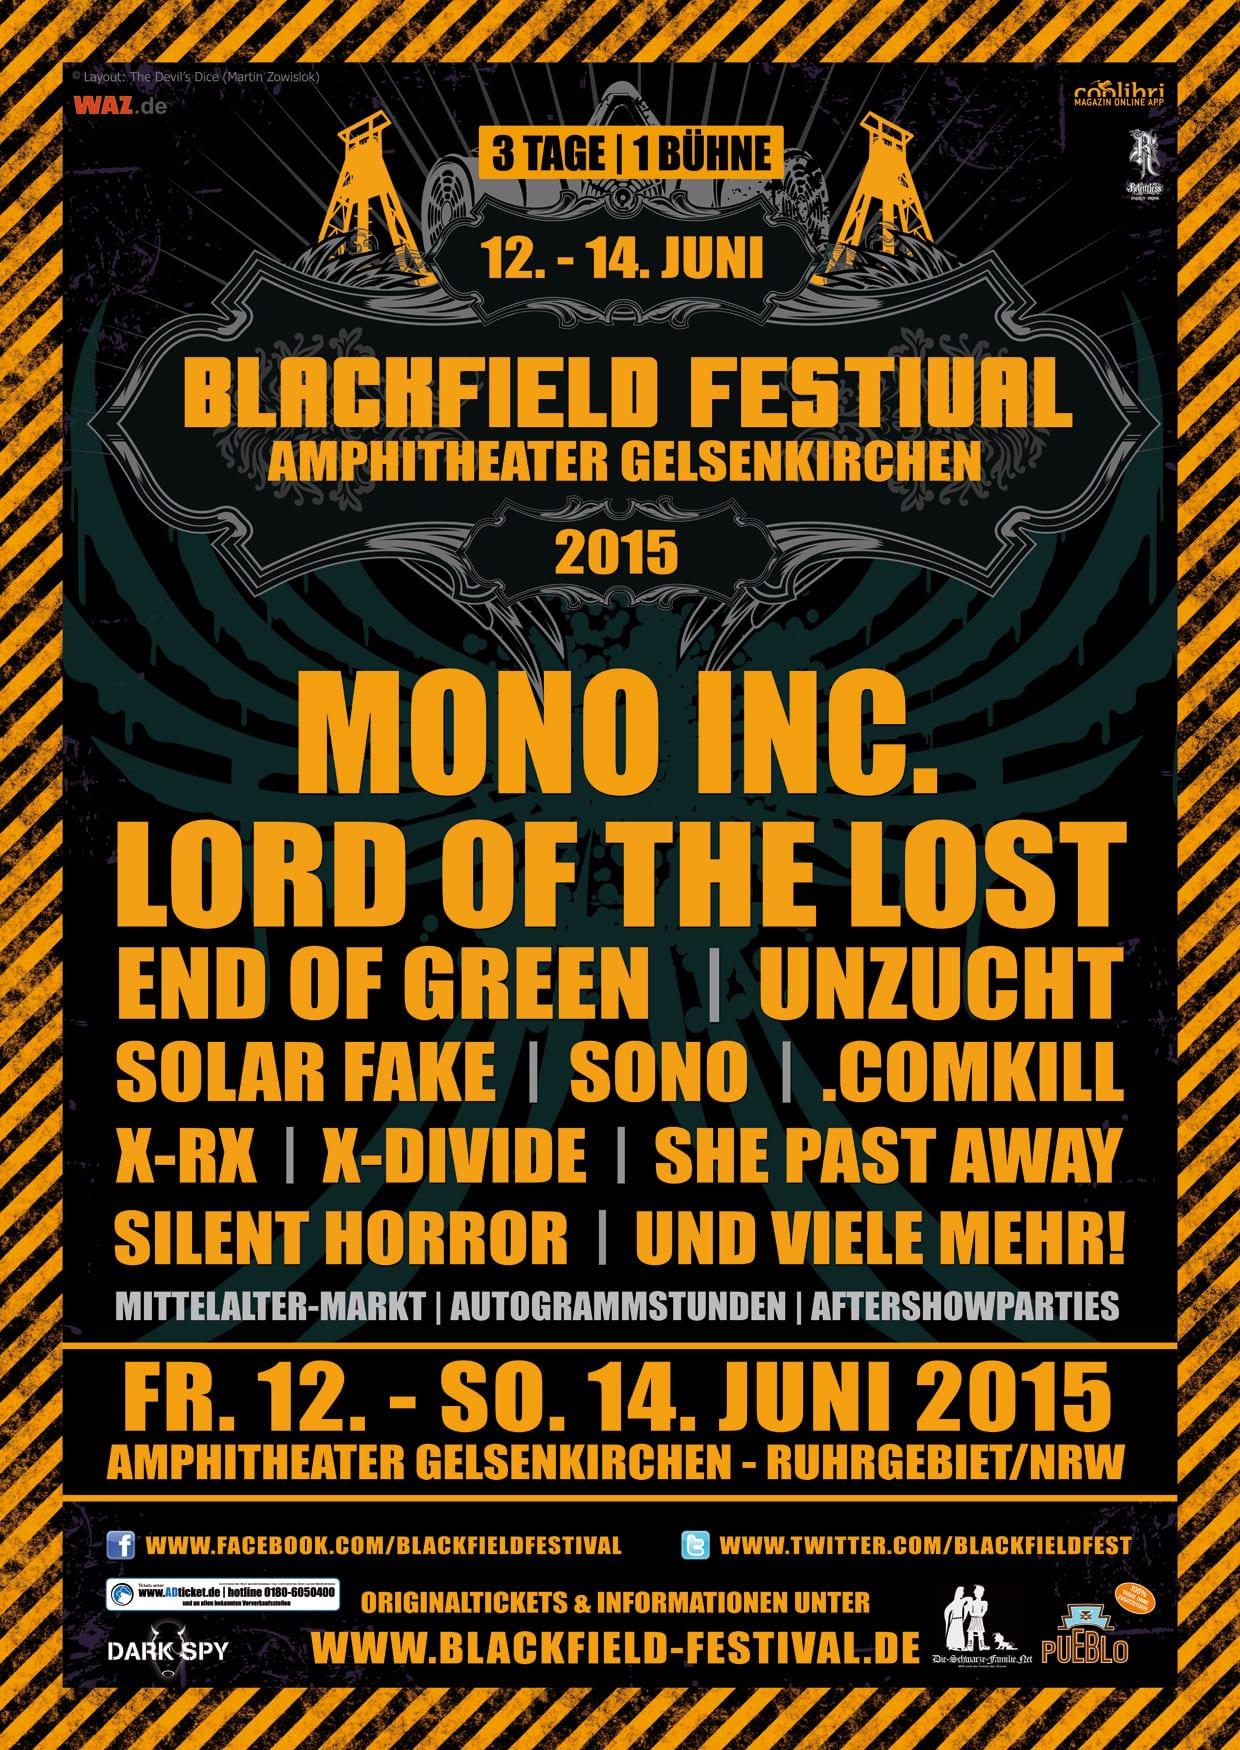 Official Flyer: Blackfield Festival 2015